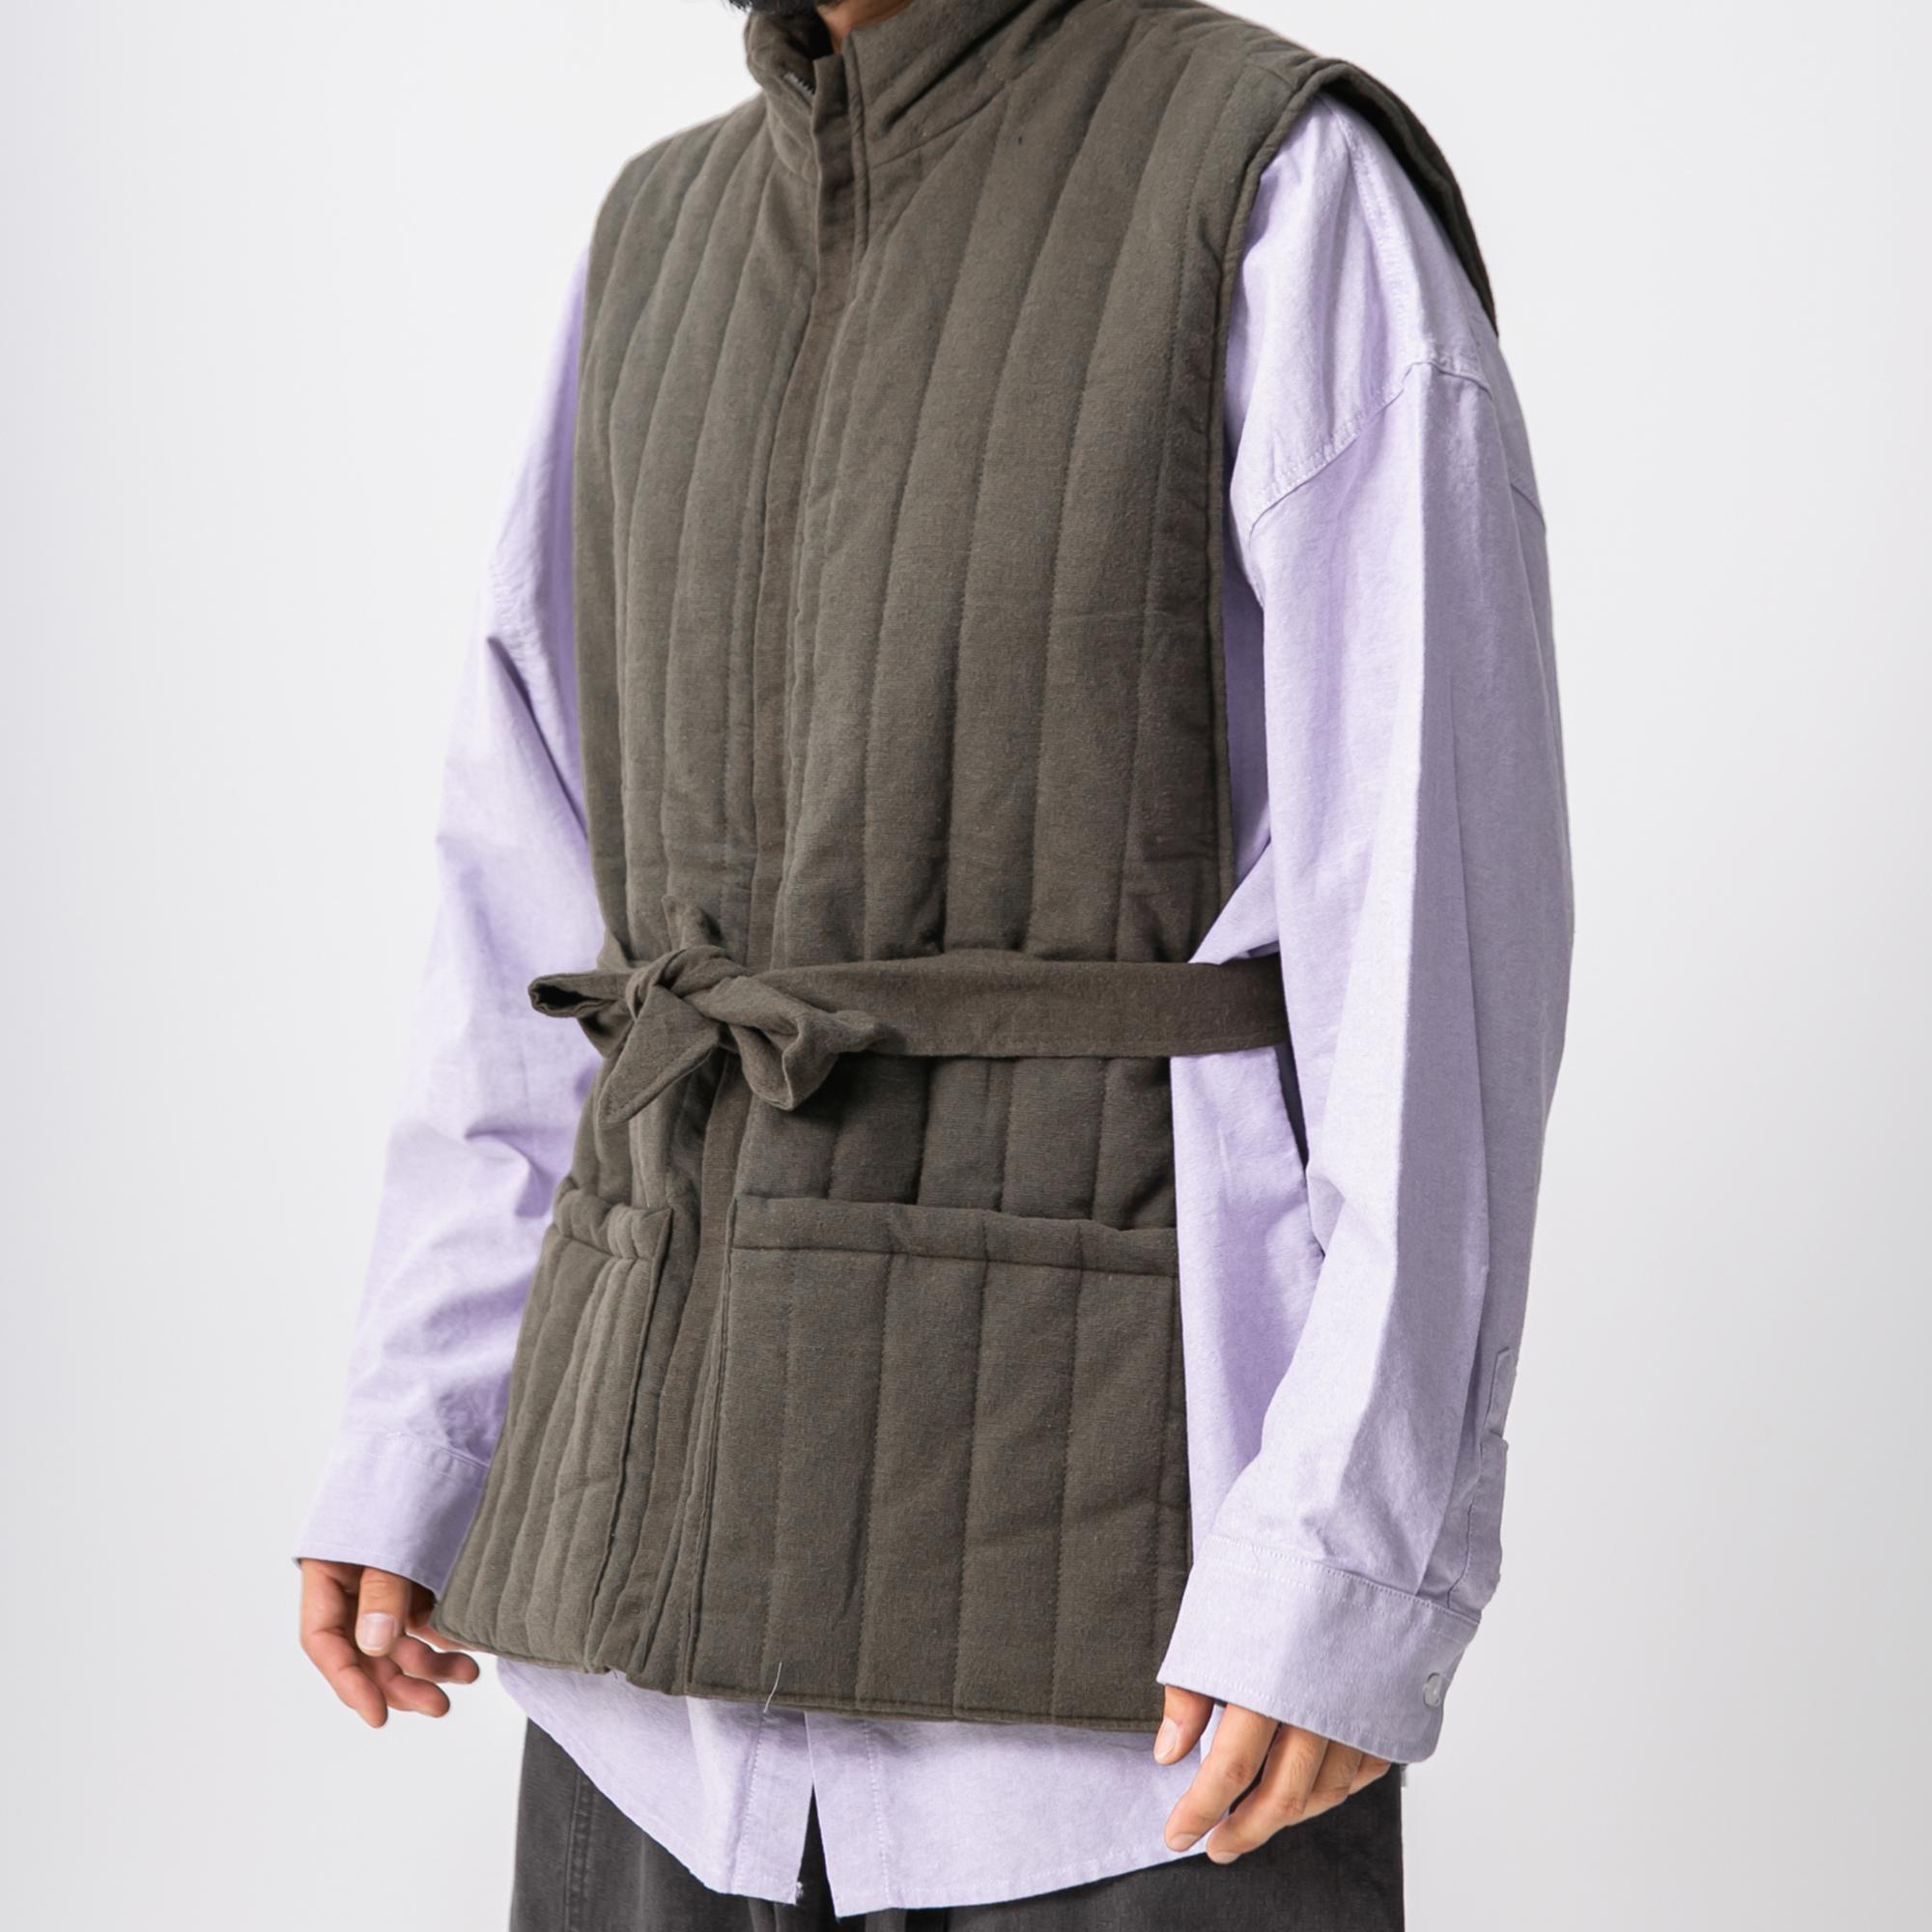 Opening Robe Padding Vest - Khaki